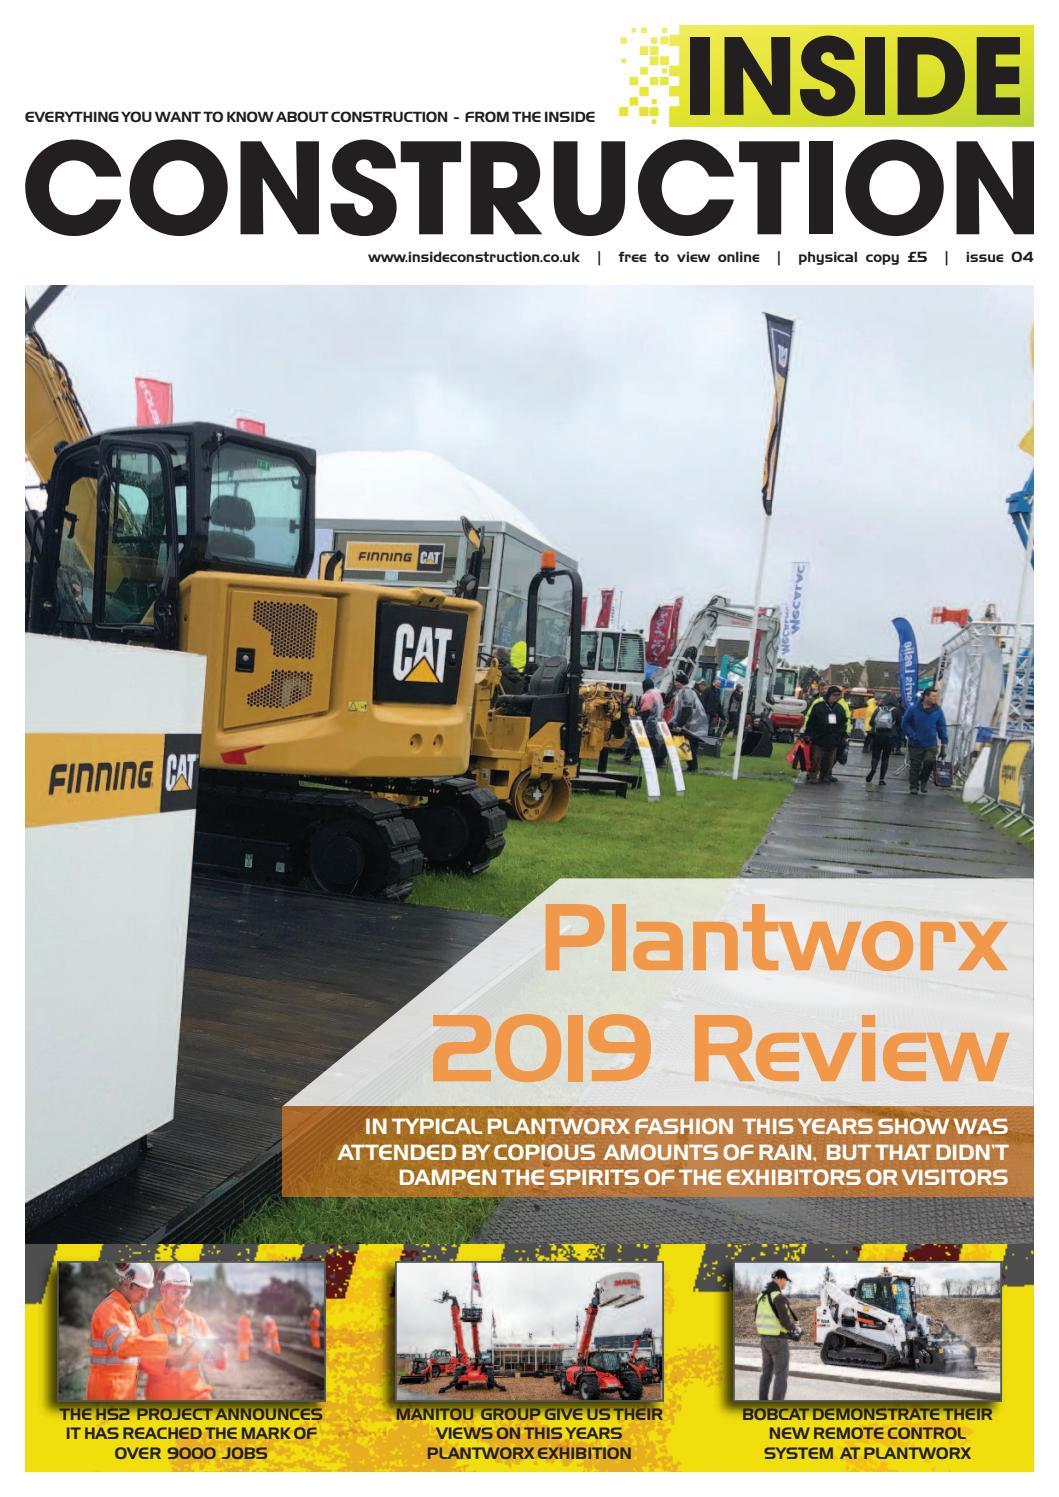 Inside Construction Magazine - Issue 04